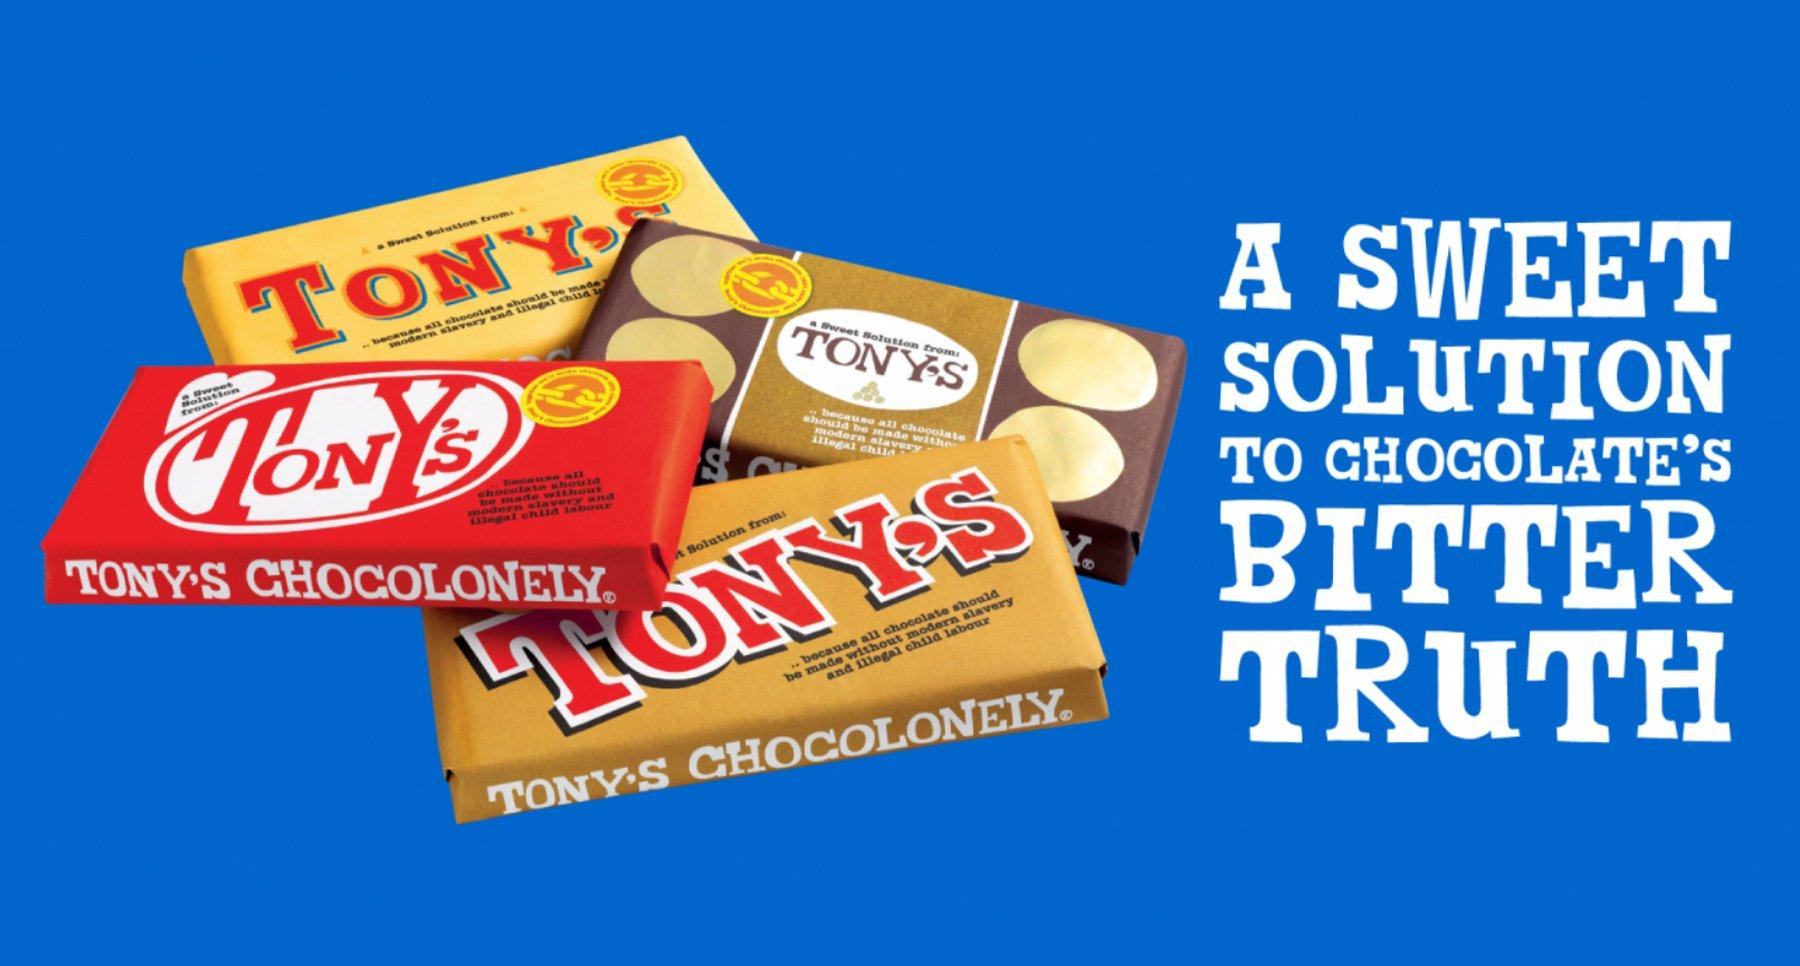 Chocolate brand Tony's Chocolonely advertisement World Chocolate Day